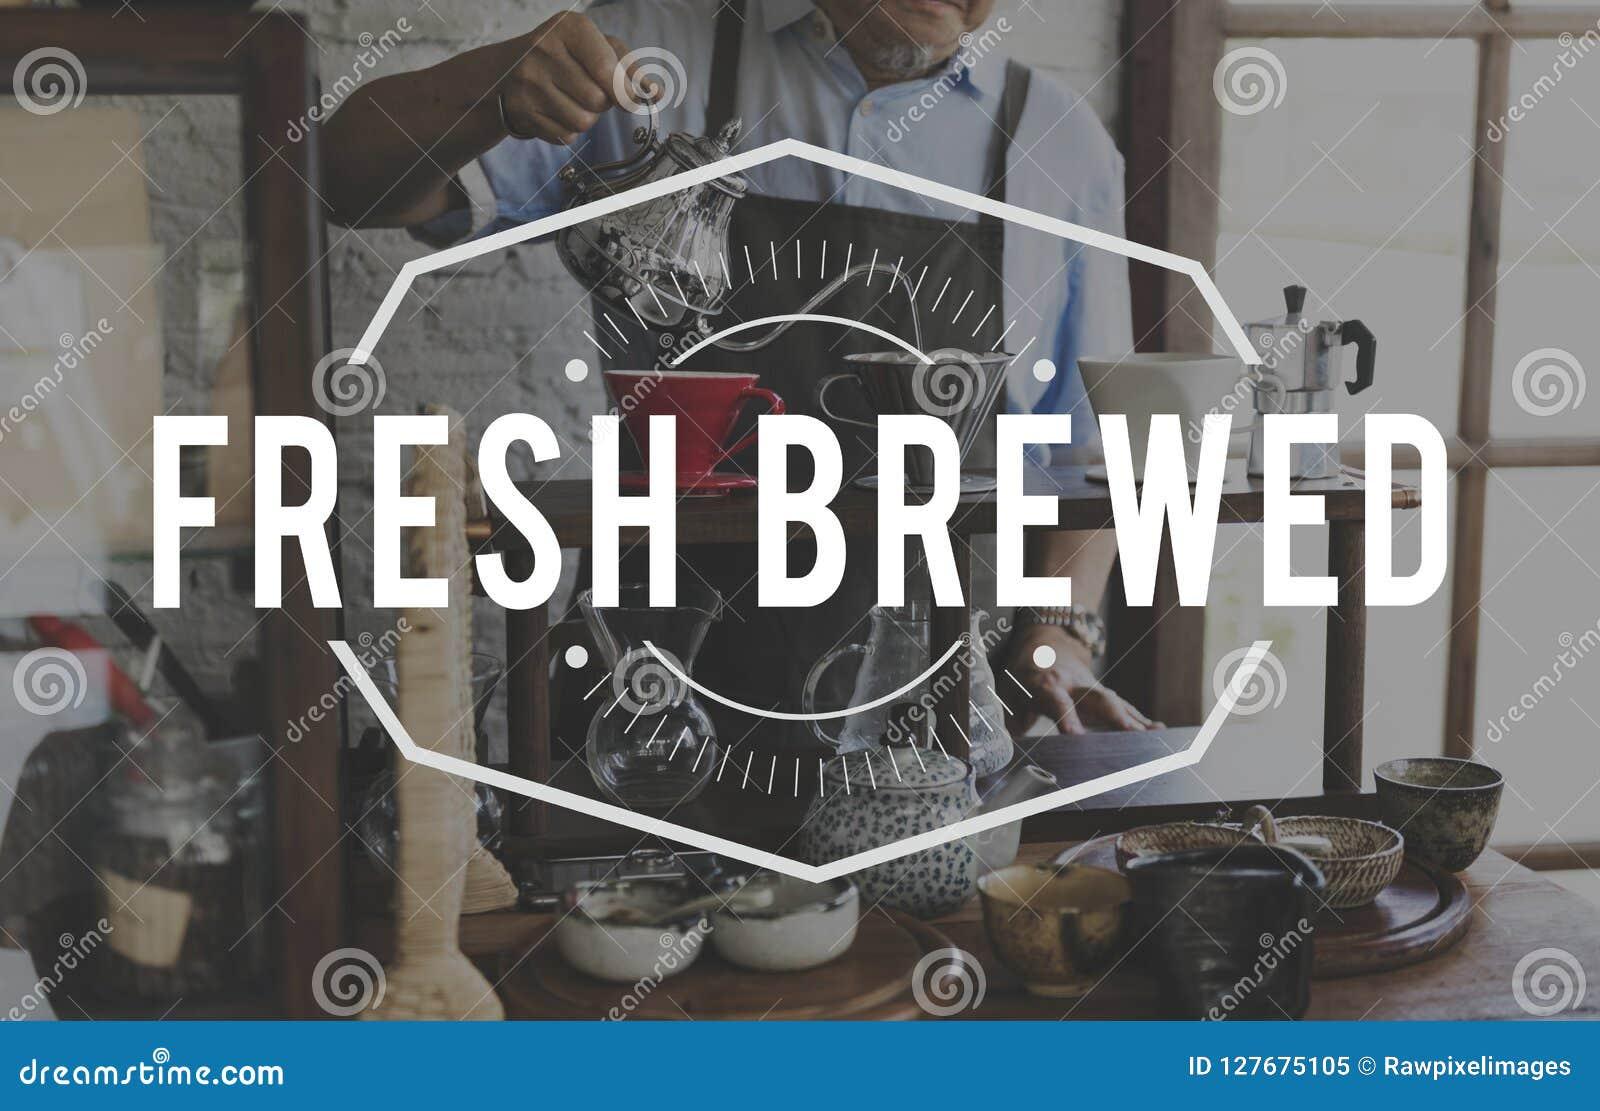 Koffie Verse Gebrouwen Word Grafische Zegelbanner